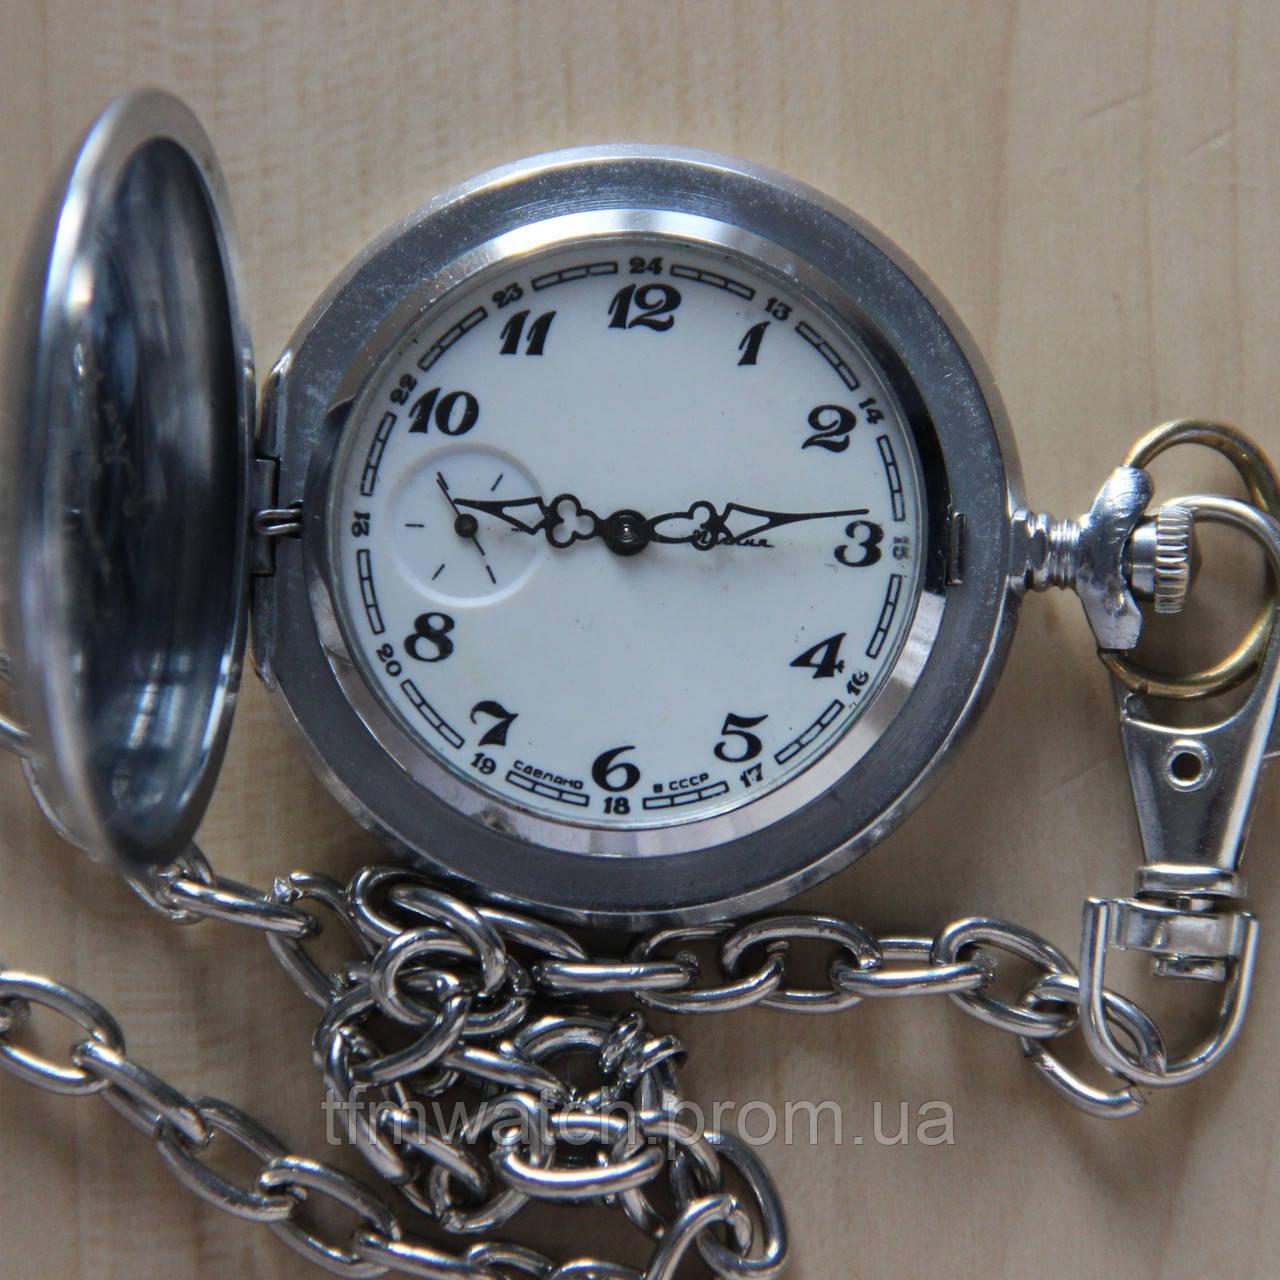 Часы карманные глухарь продам молния скупка ручные часы